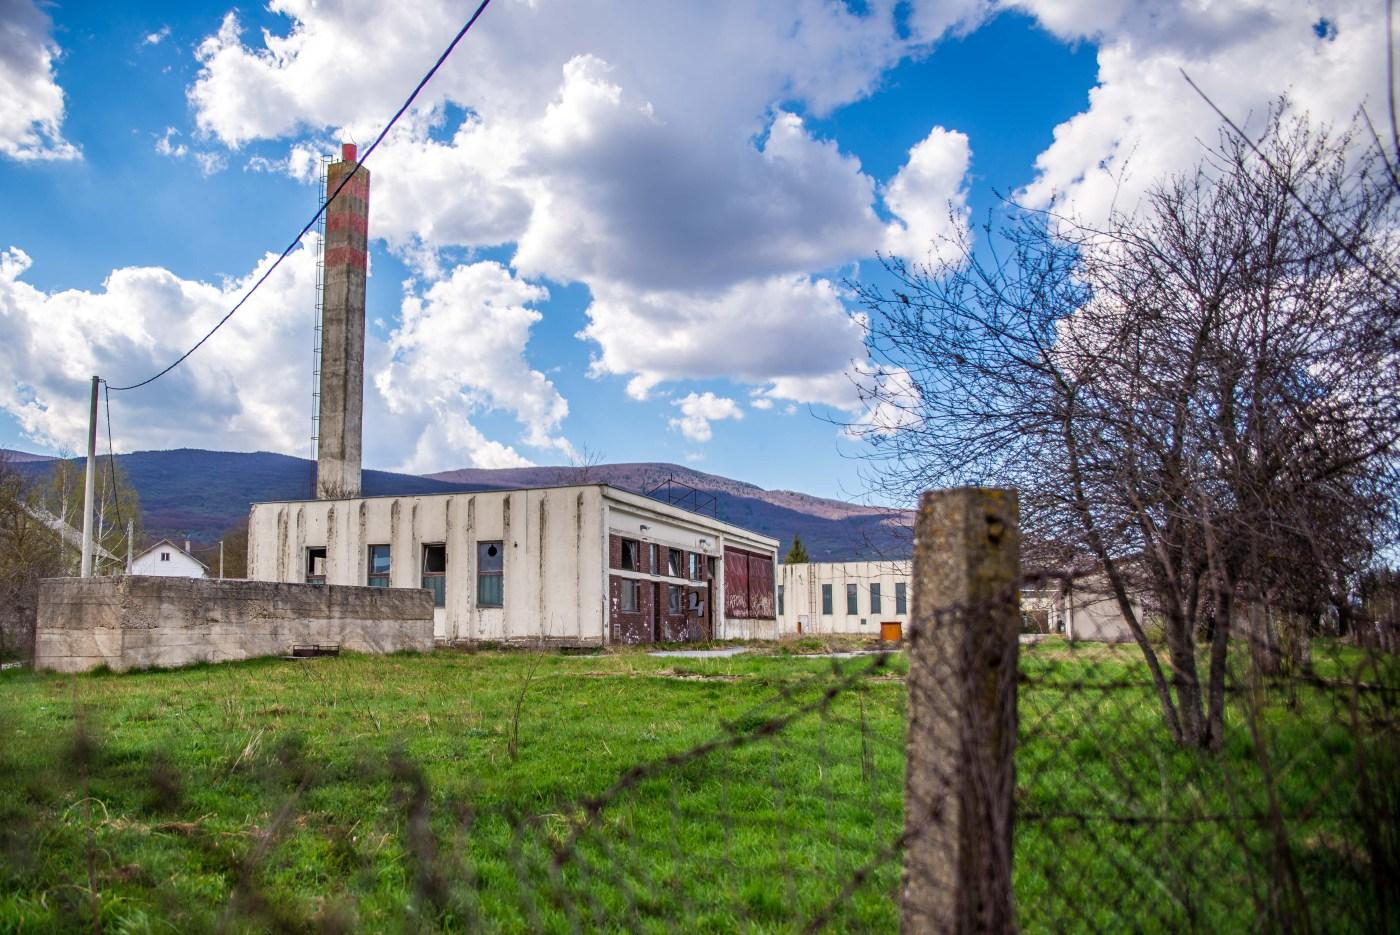 Hrvaška croatie voyage blog icietlabas ici et là-bas